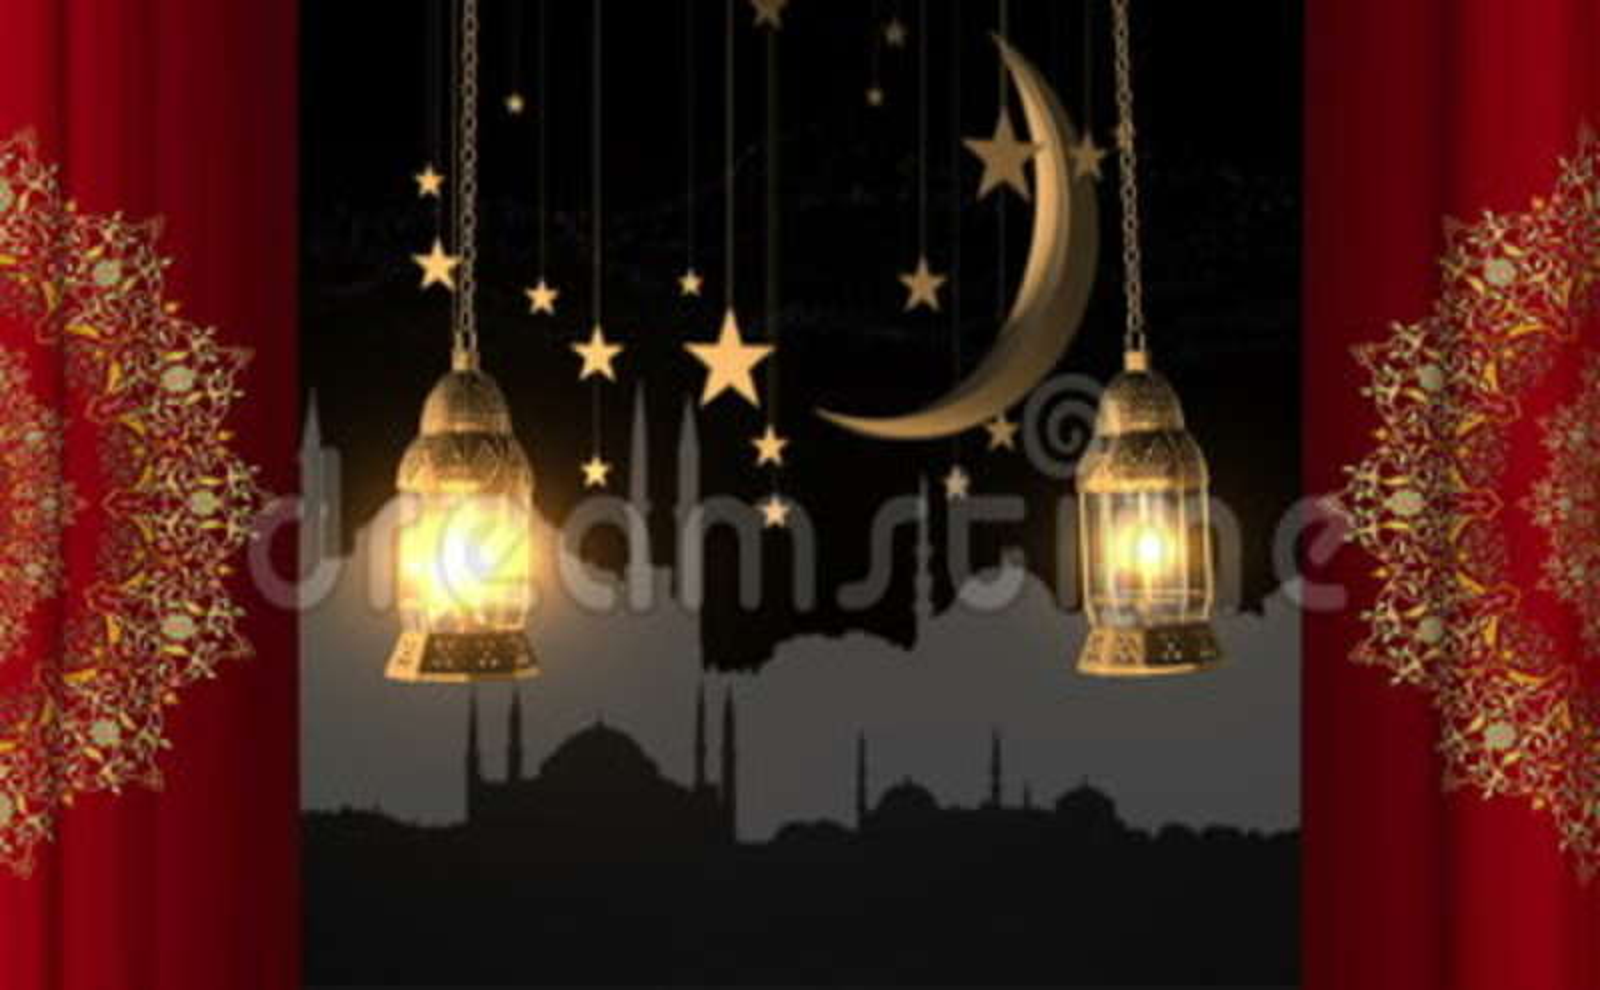 Islamic Background Animation Stock Footage & Videos - 1,503 Stock Videos